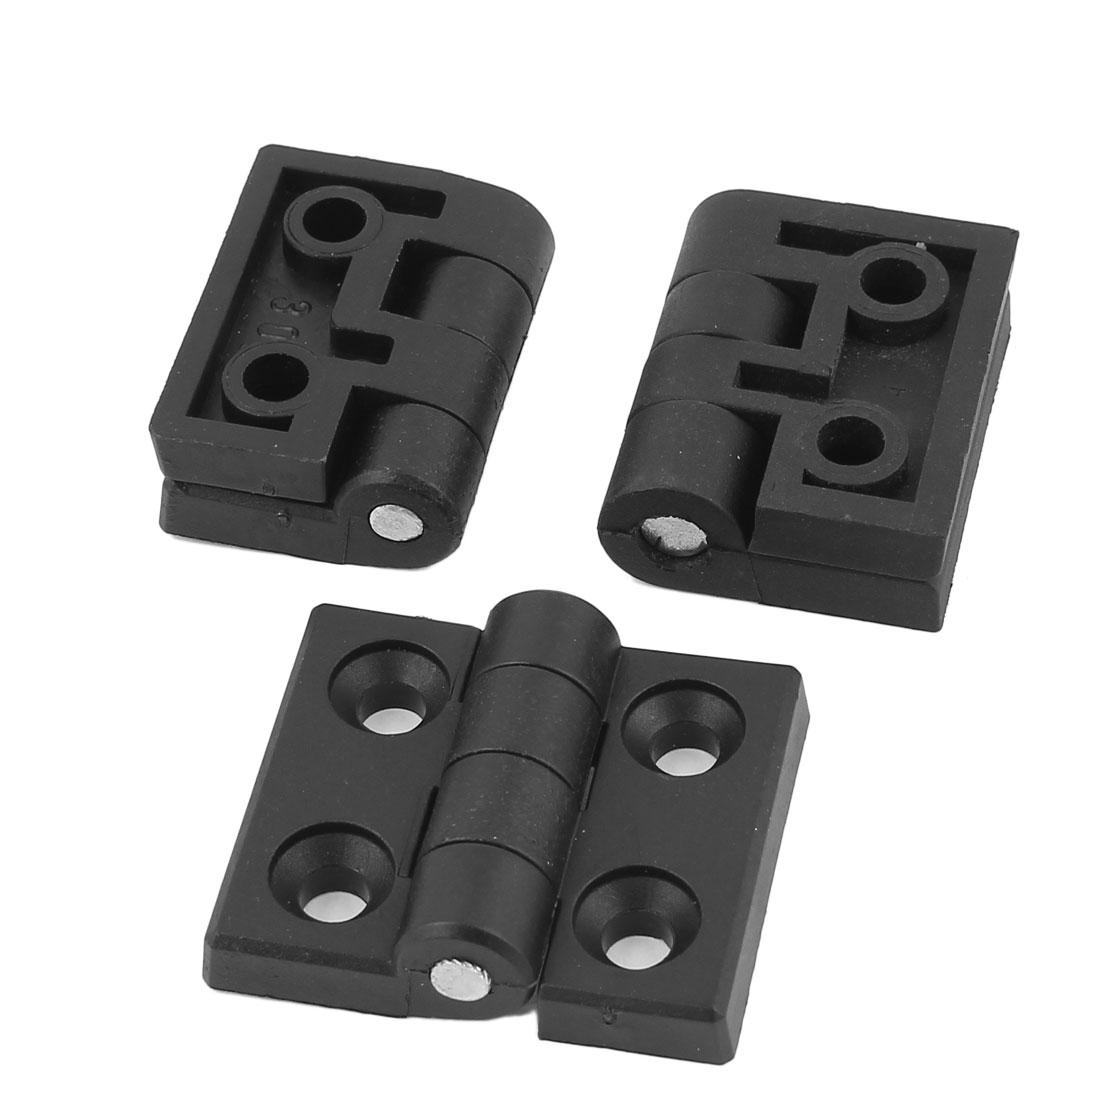 3pcs 50mmx45mm Black Plastic Folding Cabinet Cupboard Gate Door Flap Butt Ball Bearing Hinge